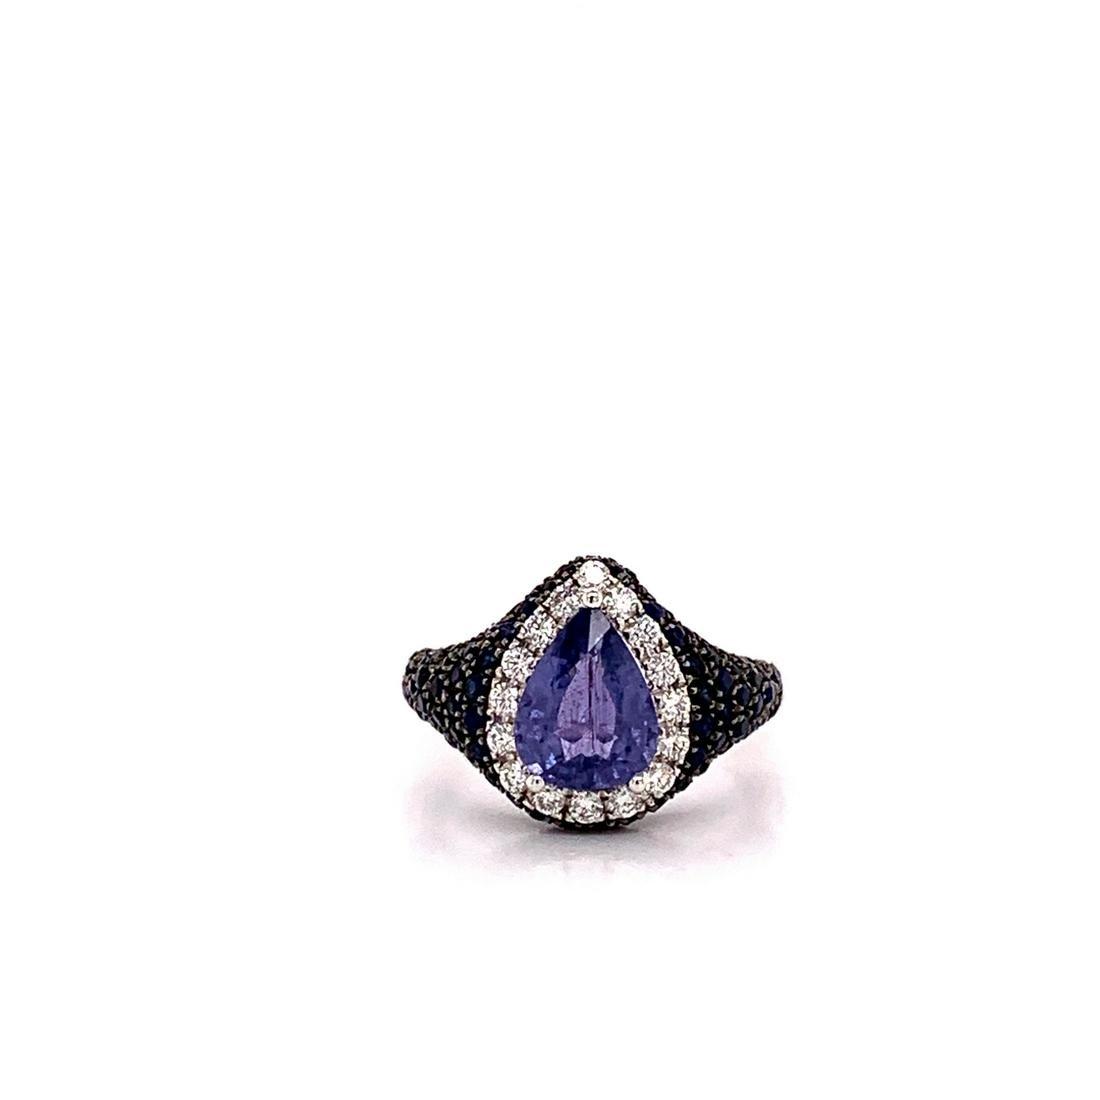 3.50ctw Blue Sapphire & 14K Ring W/Diamond Accents